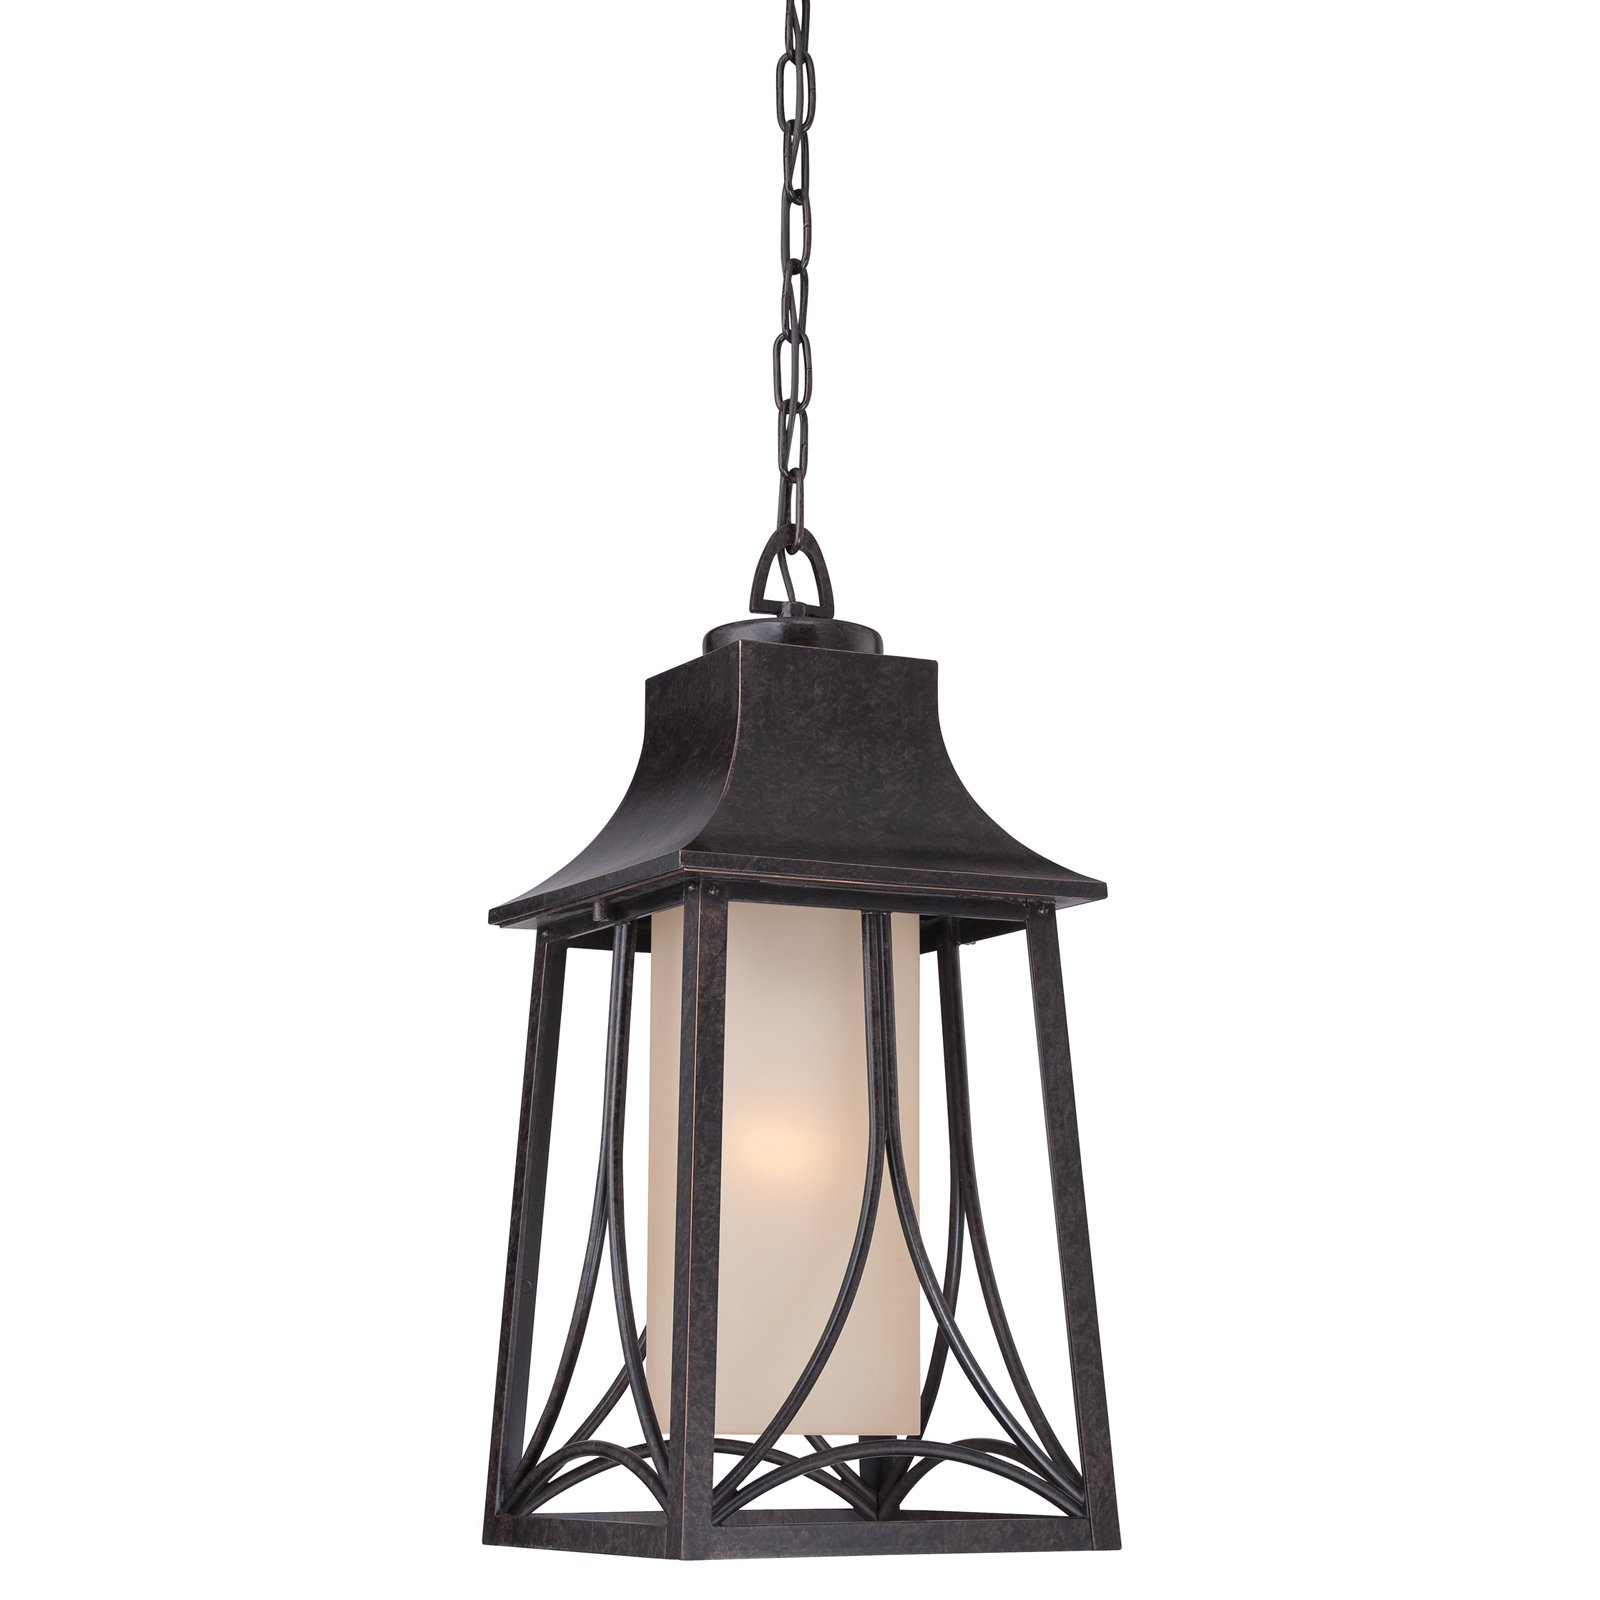 Quoizel Hunter HTR1908IB Outdoor Hanging Lantern